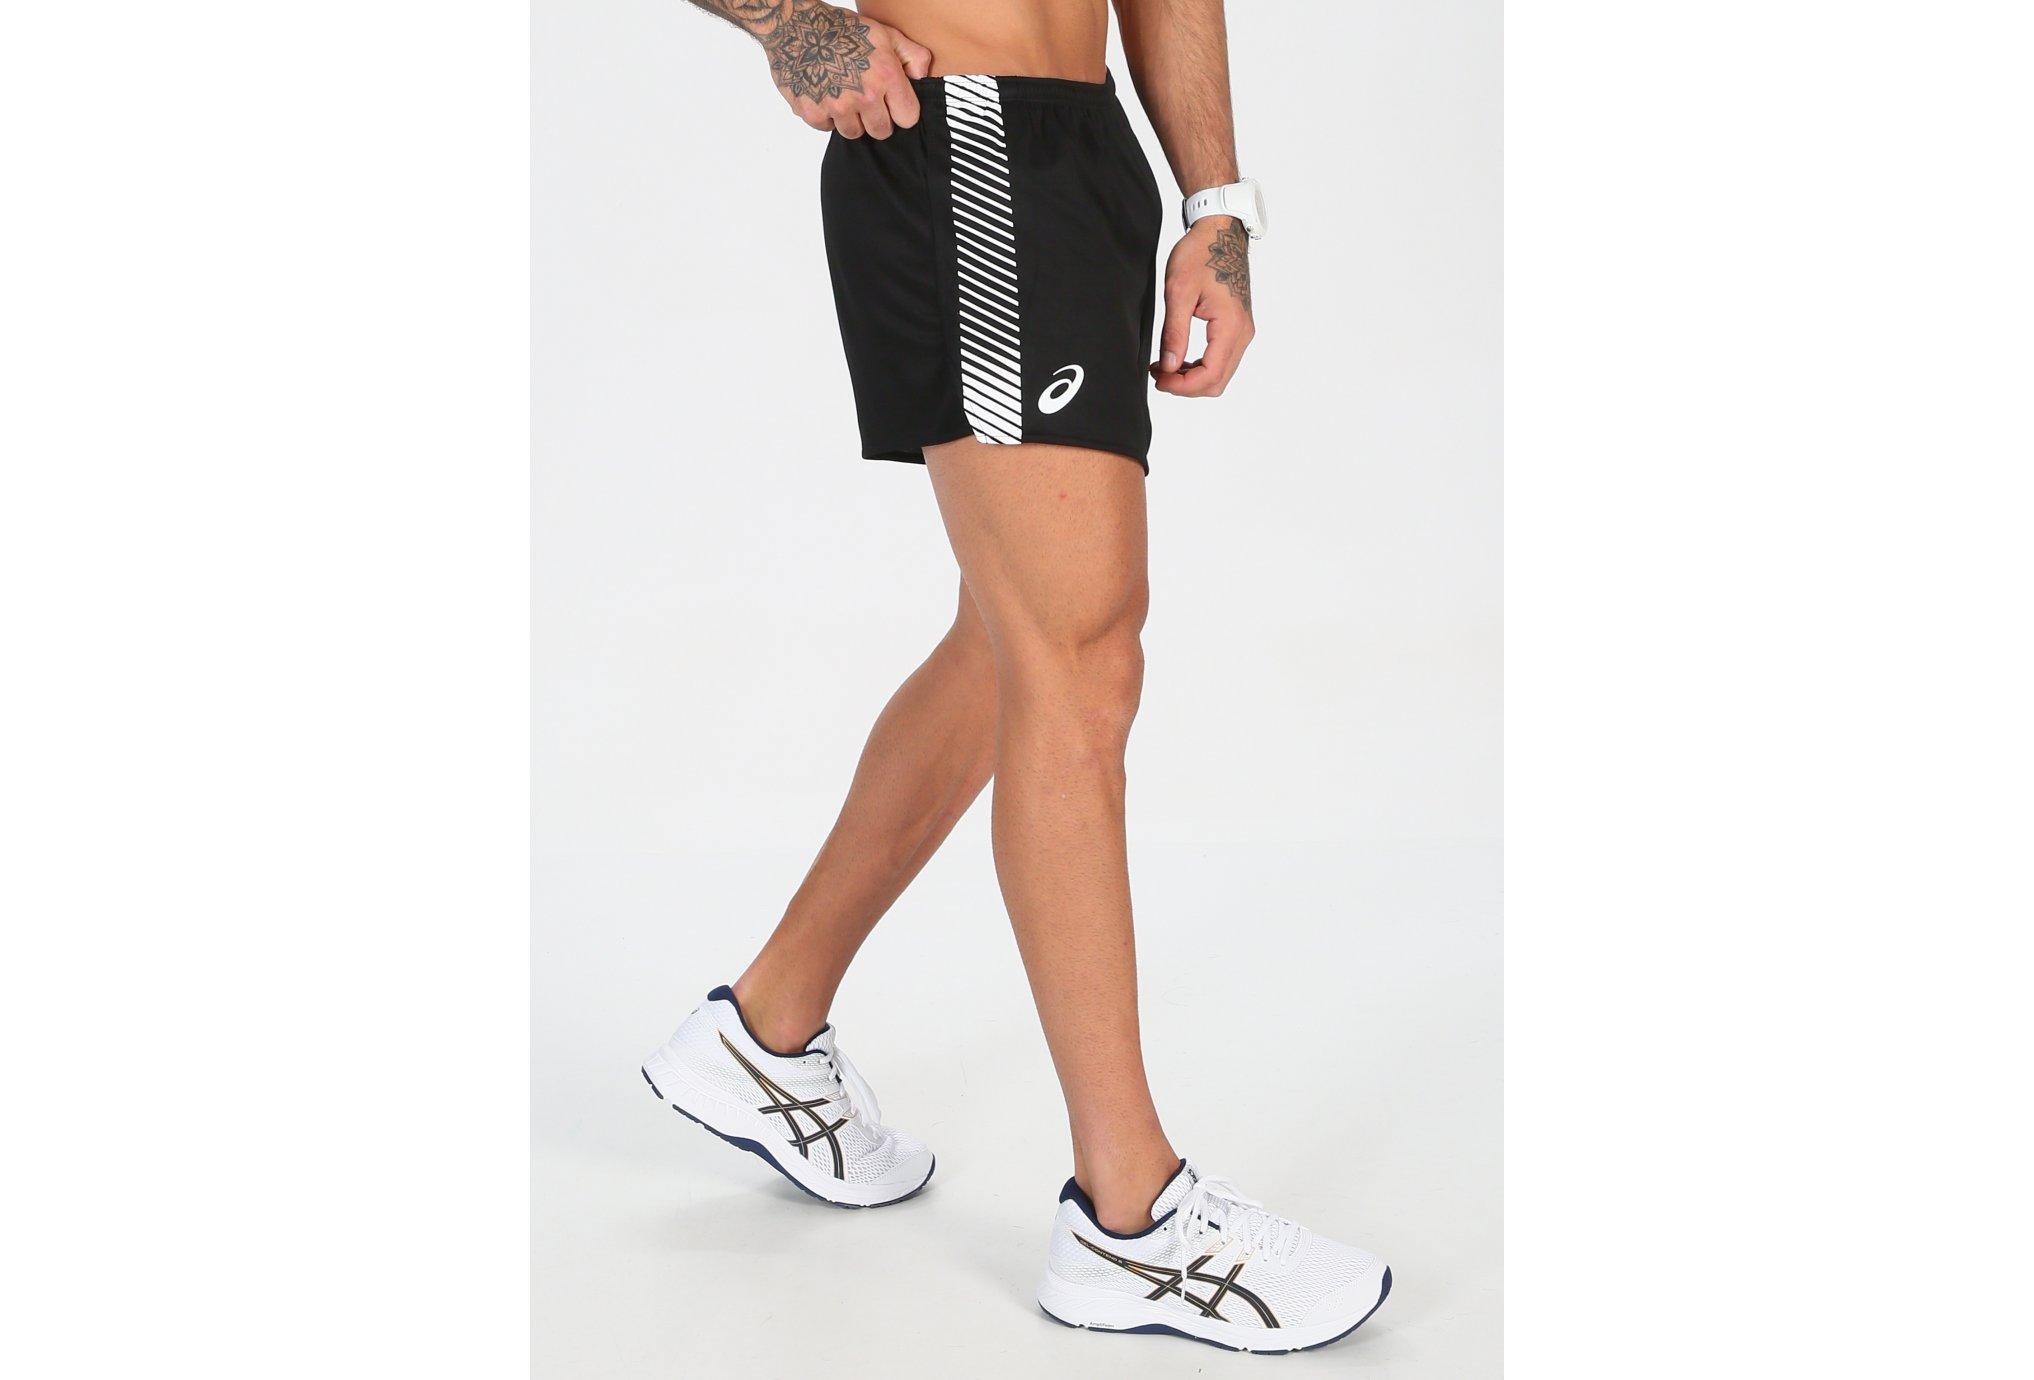 Asics Practice Knit M vêtement running homme